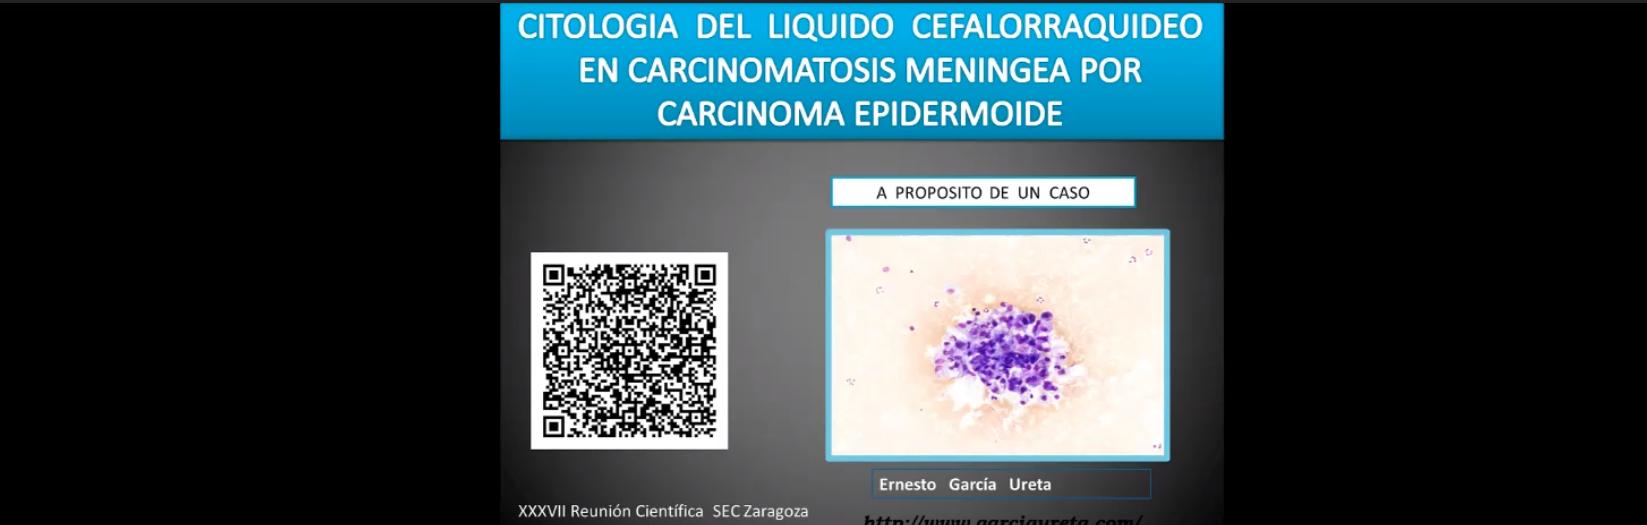 Meningitis carcinomatosa por carcinoma epidermoide